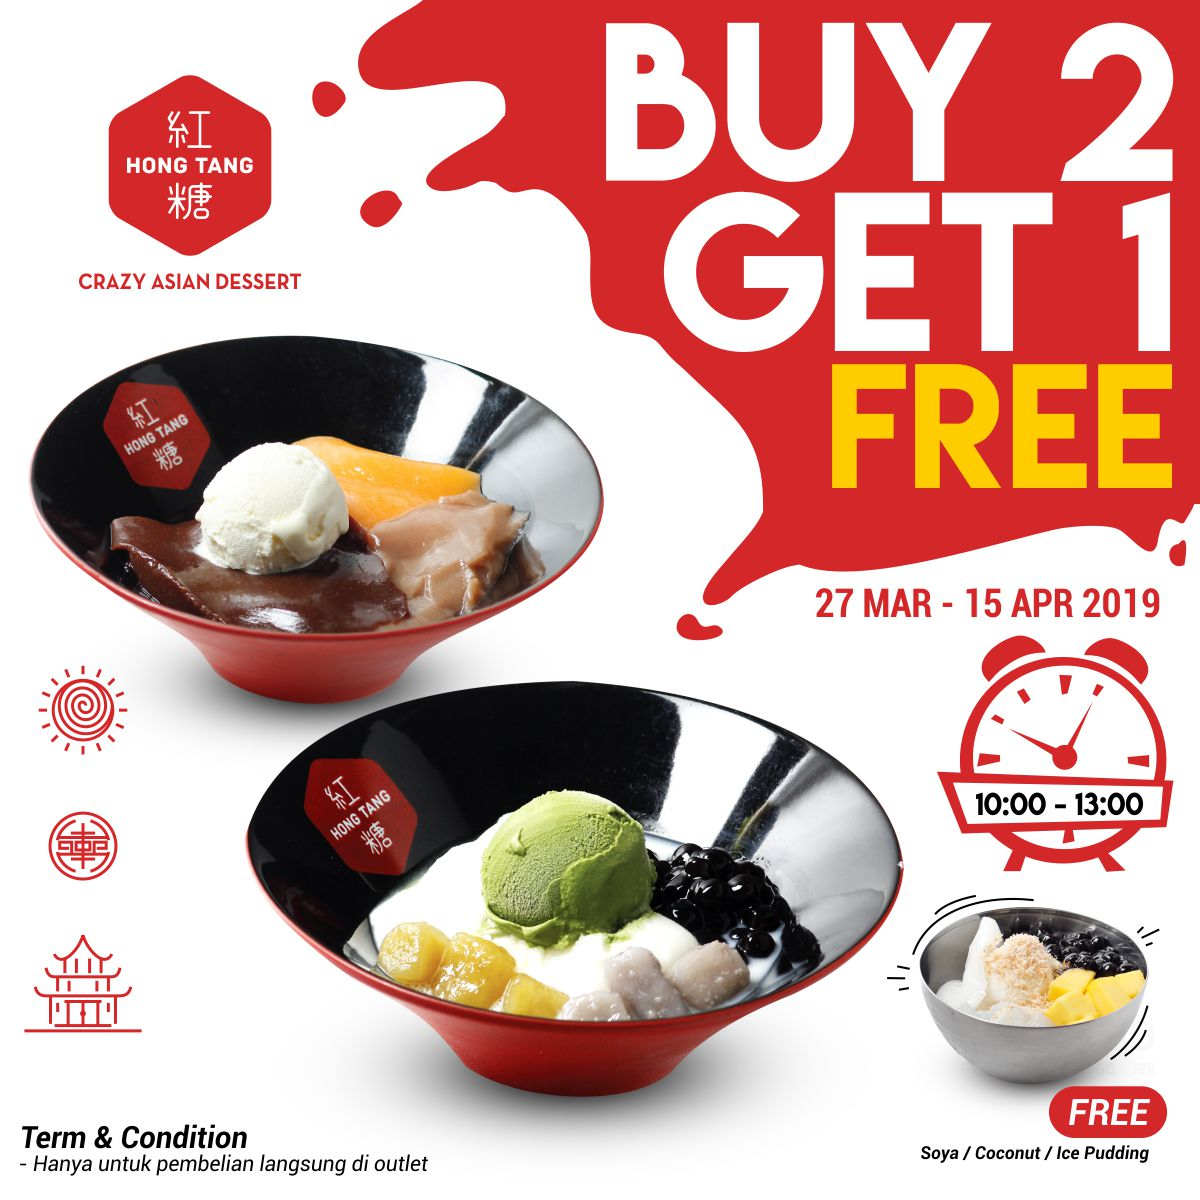 Hong Tang Promo Happy Hour - Buy 2 get 1 free